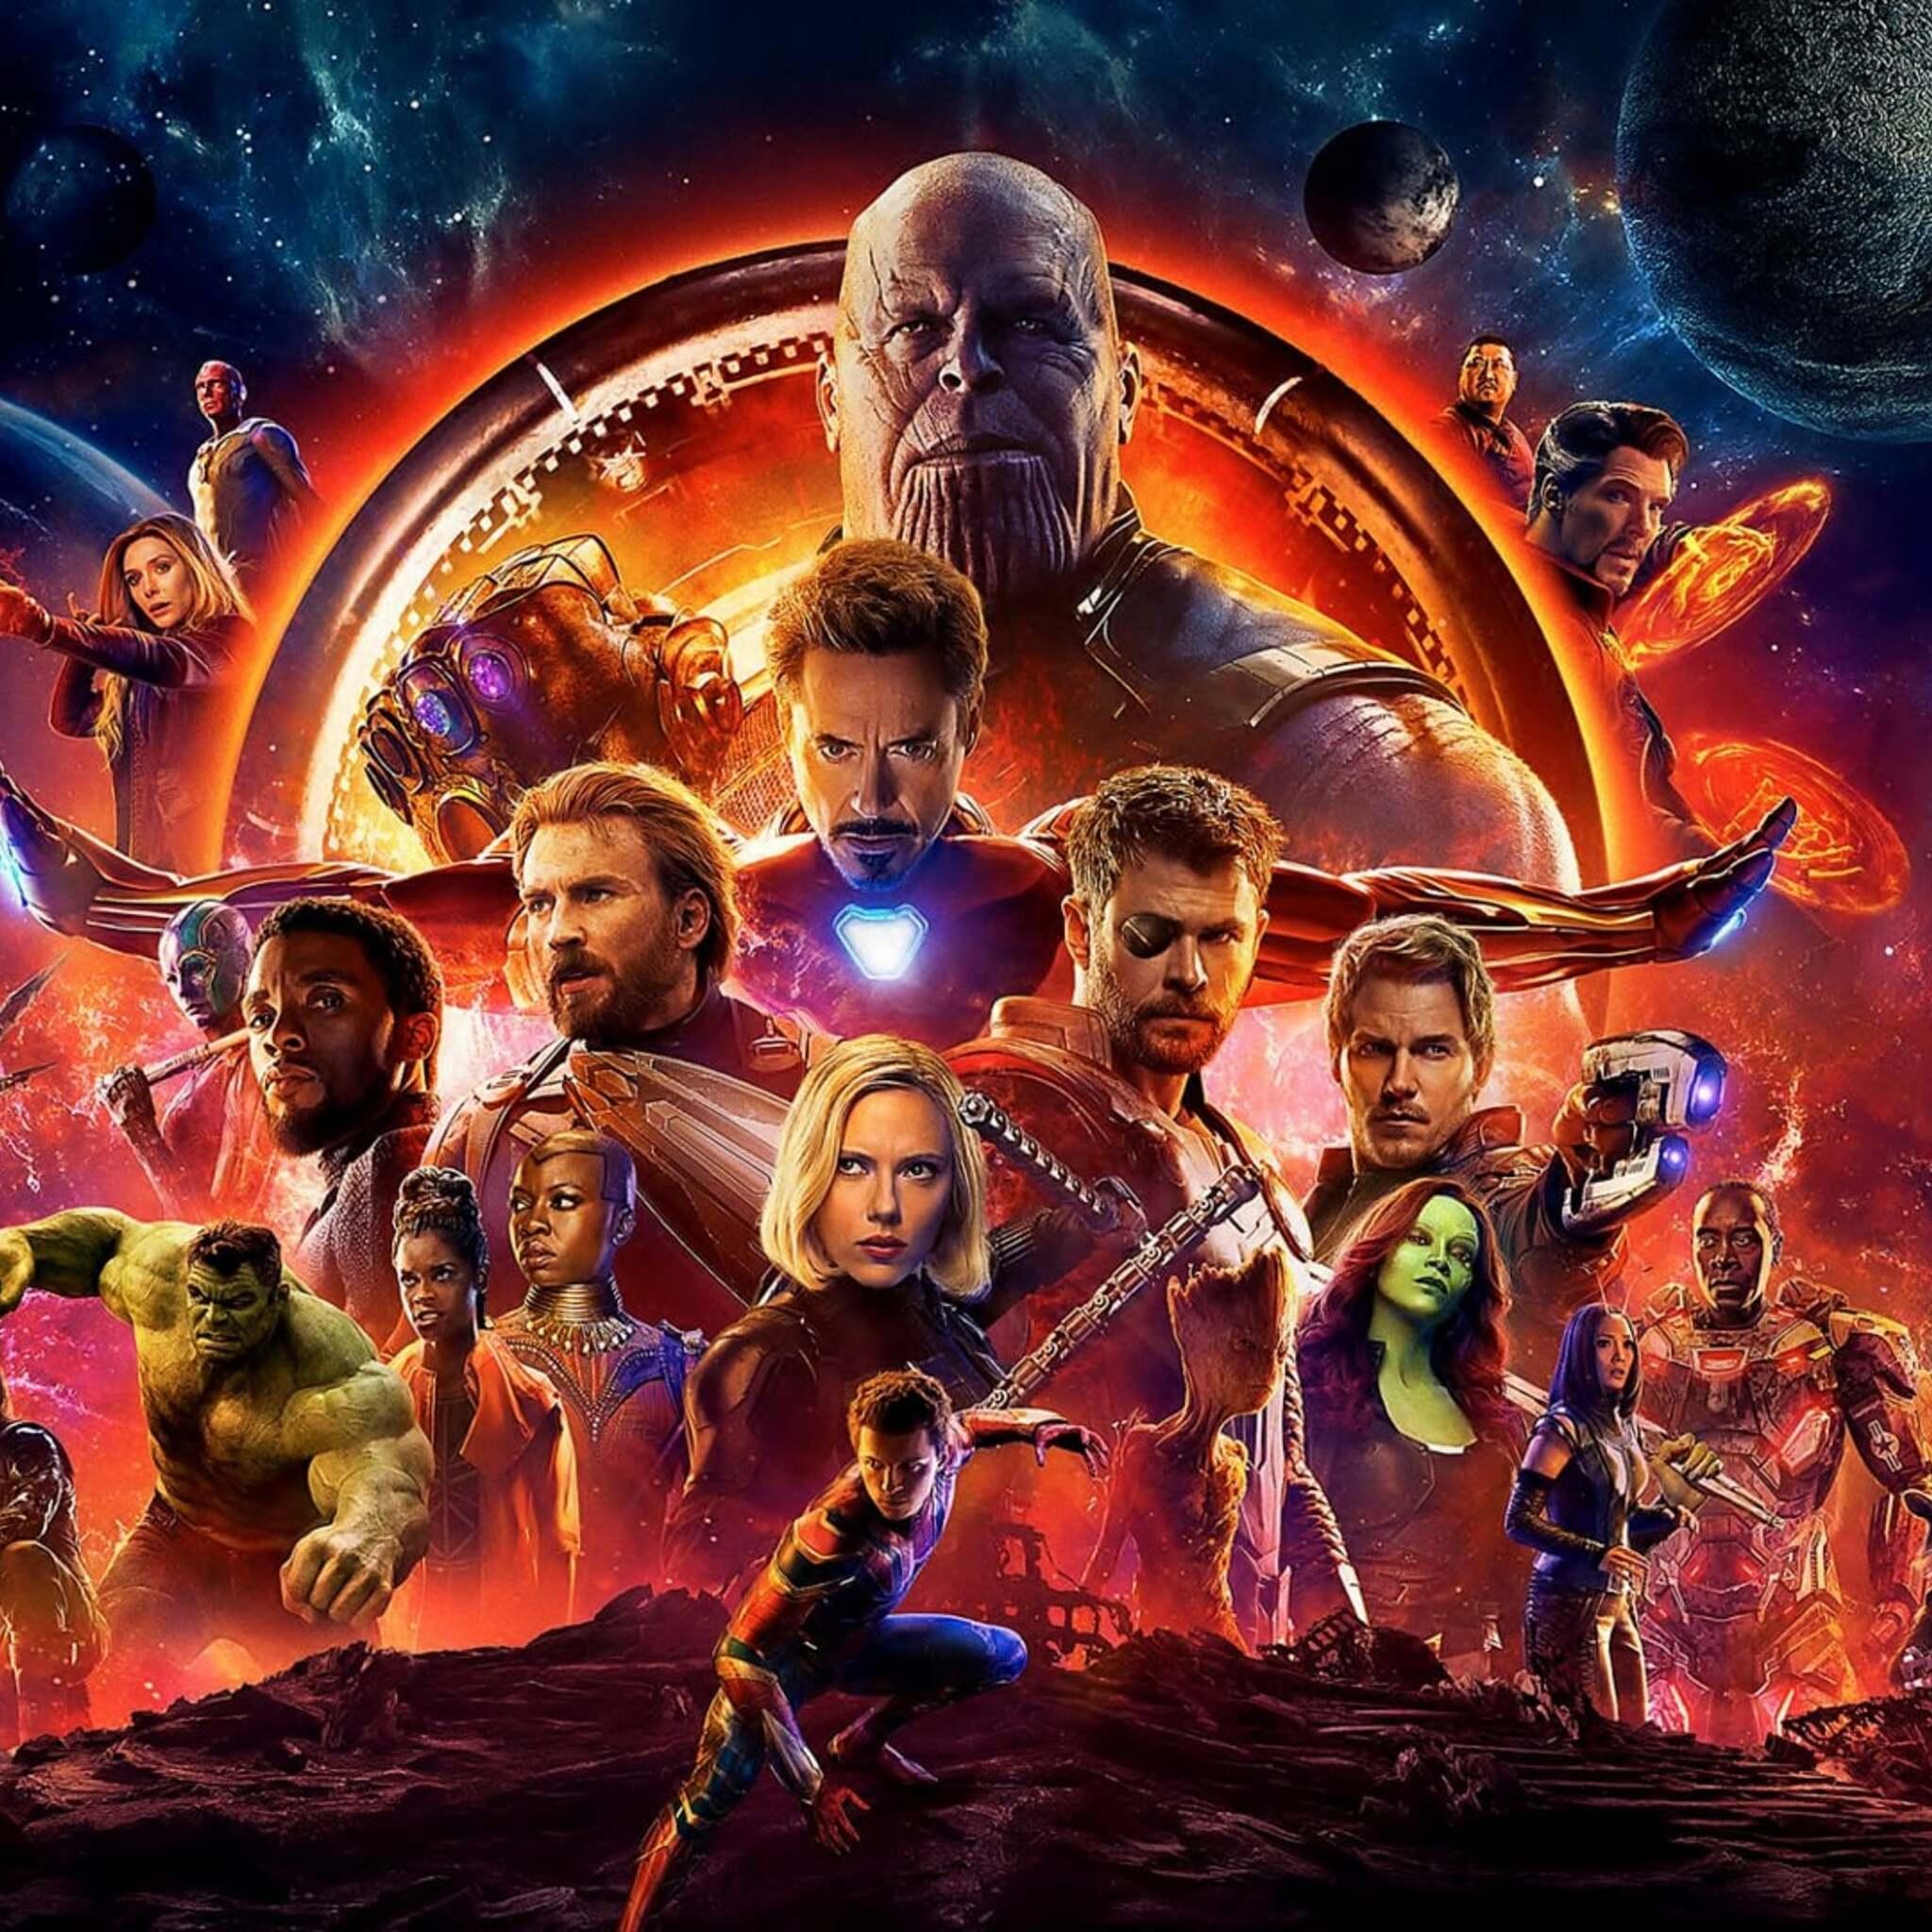 2048x2048 Avengers Infinity War Official Poster 2018 Ipad Air Hd 4k